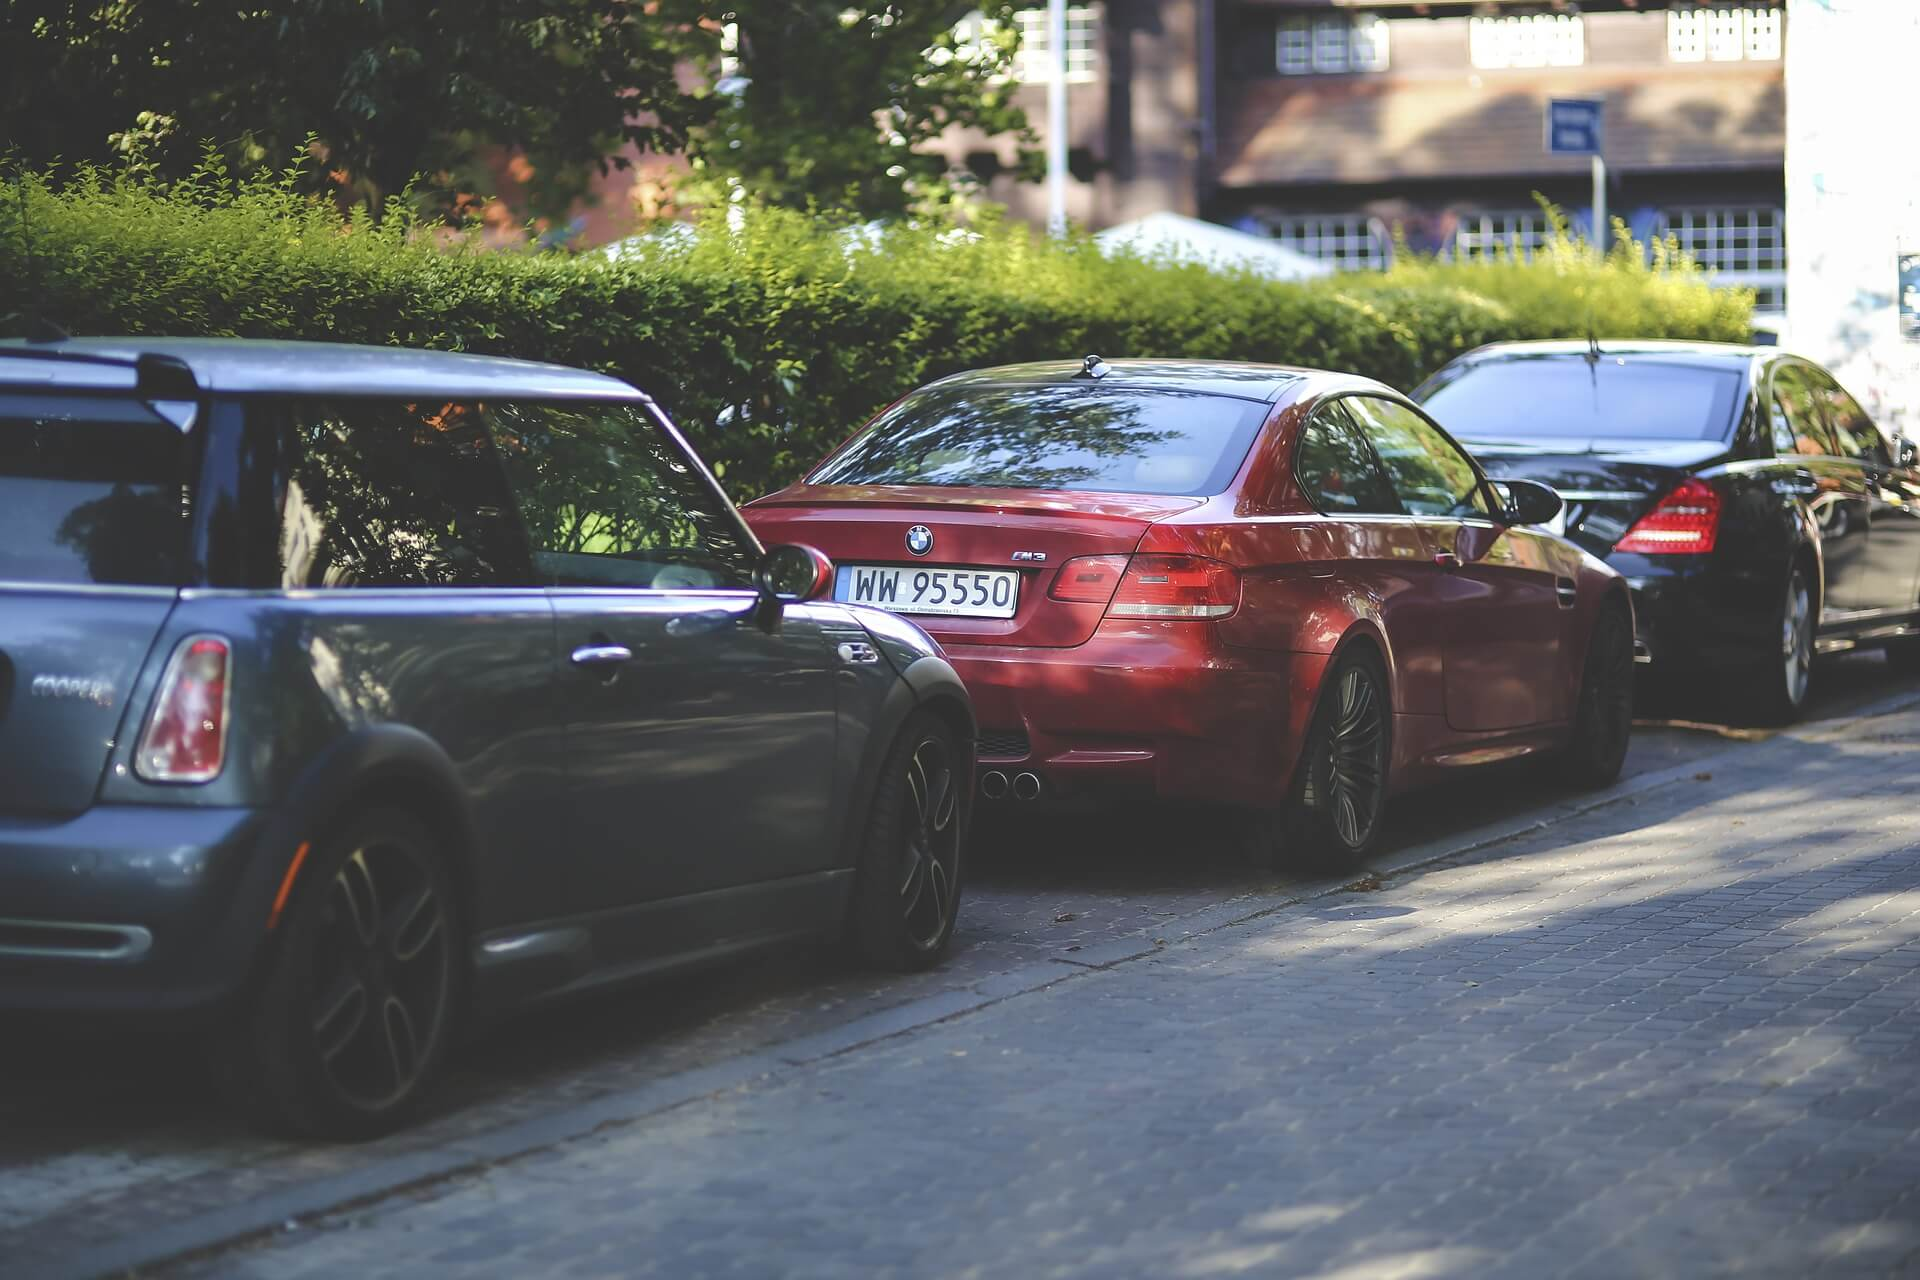 sensor de estacionamento baliza